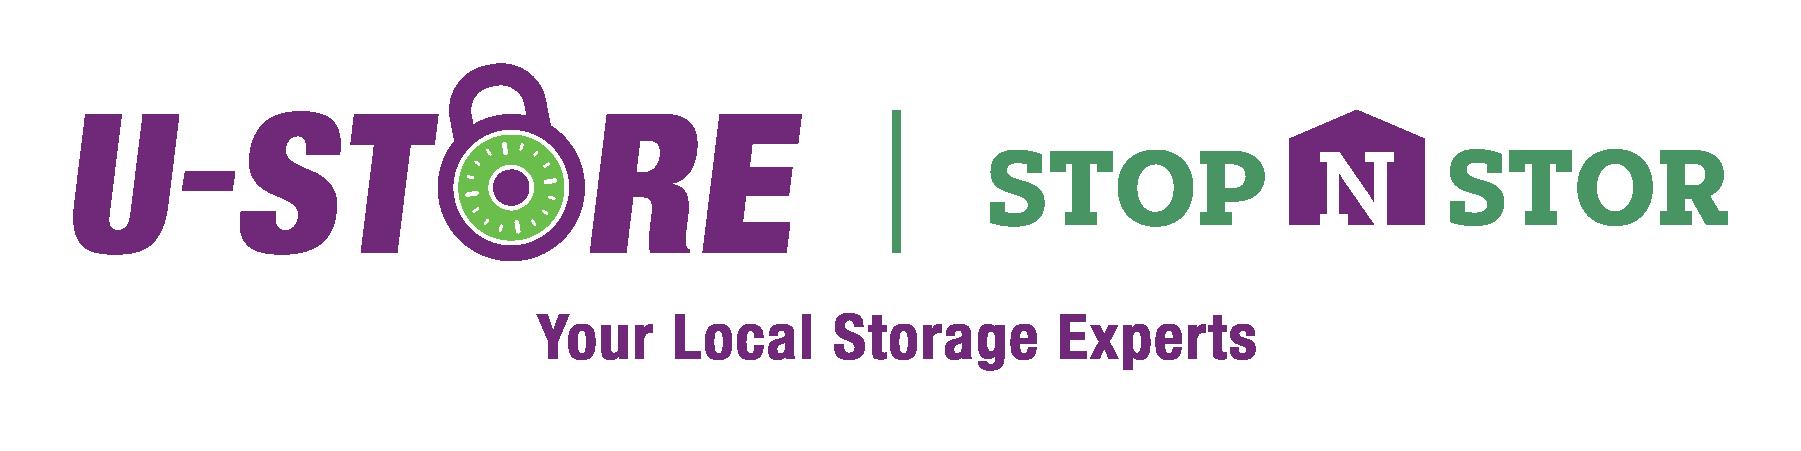 U-Store MI & Stop-N-Stor Logo